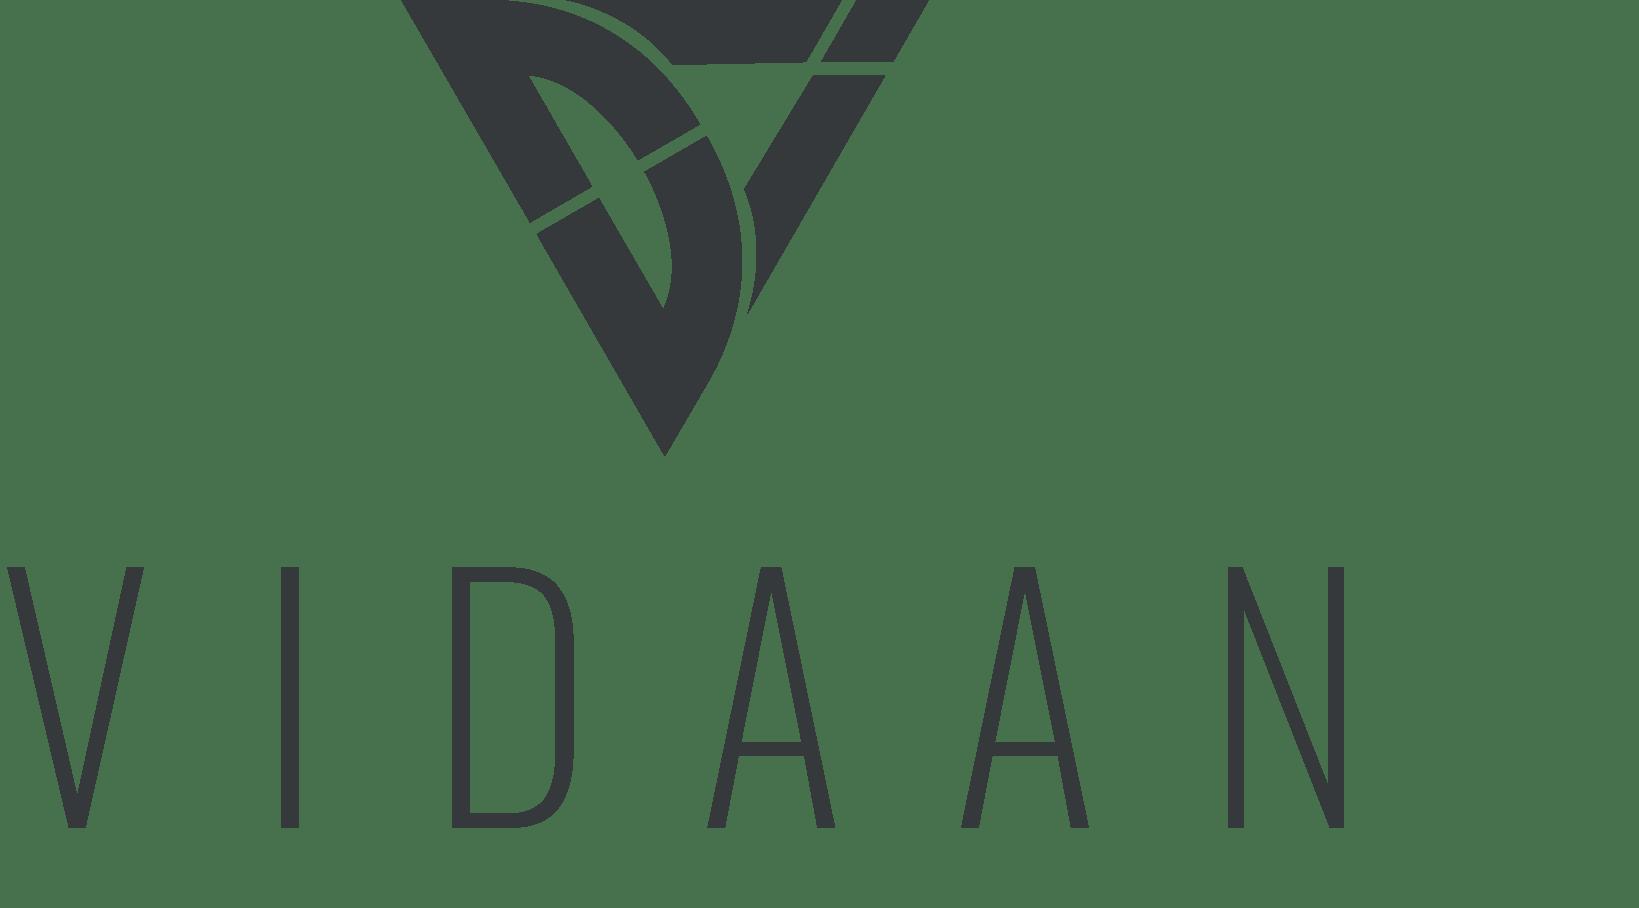 Fresher Job : Apply for Content Writer at Vidaan in New Delhi